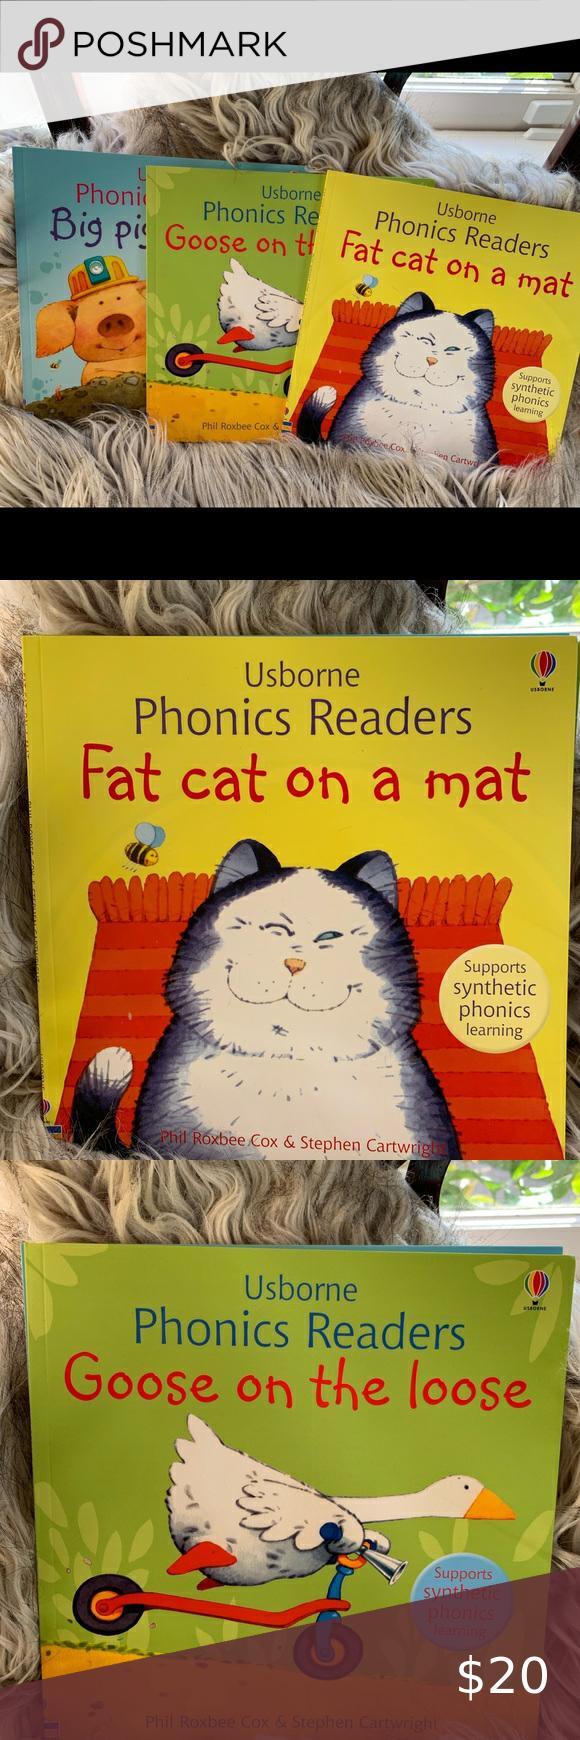 Usborne Phonics Children S Books Brand New In 2020 Phonics Childrens Books Big Pigs